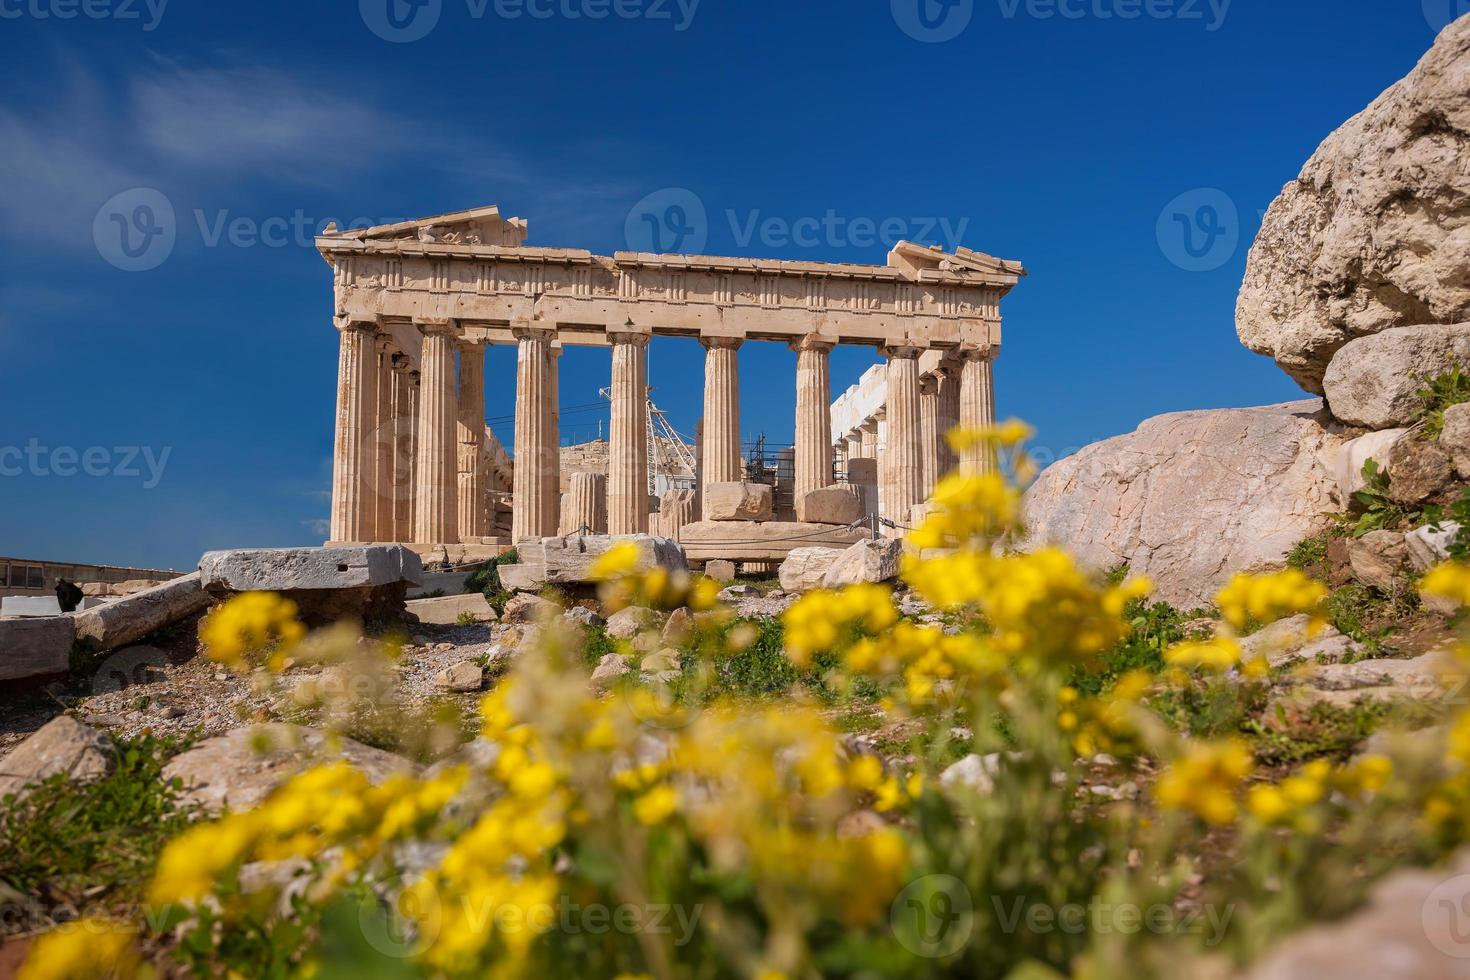 Akropolis mit Parthenontempel in Athen, Griechenland foto